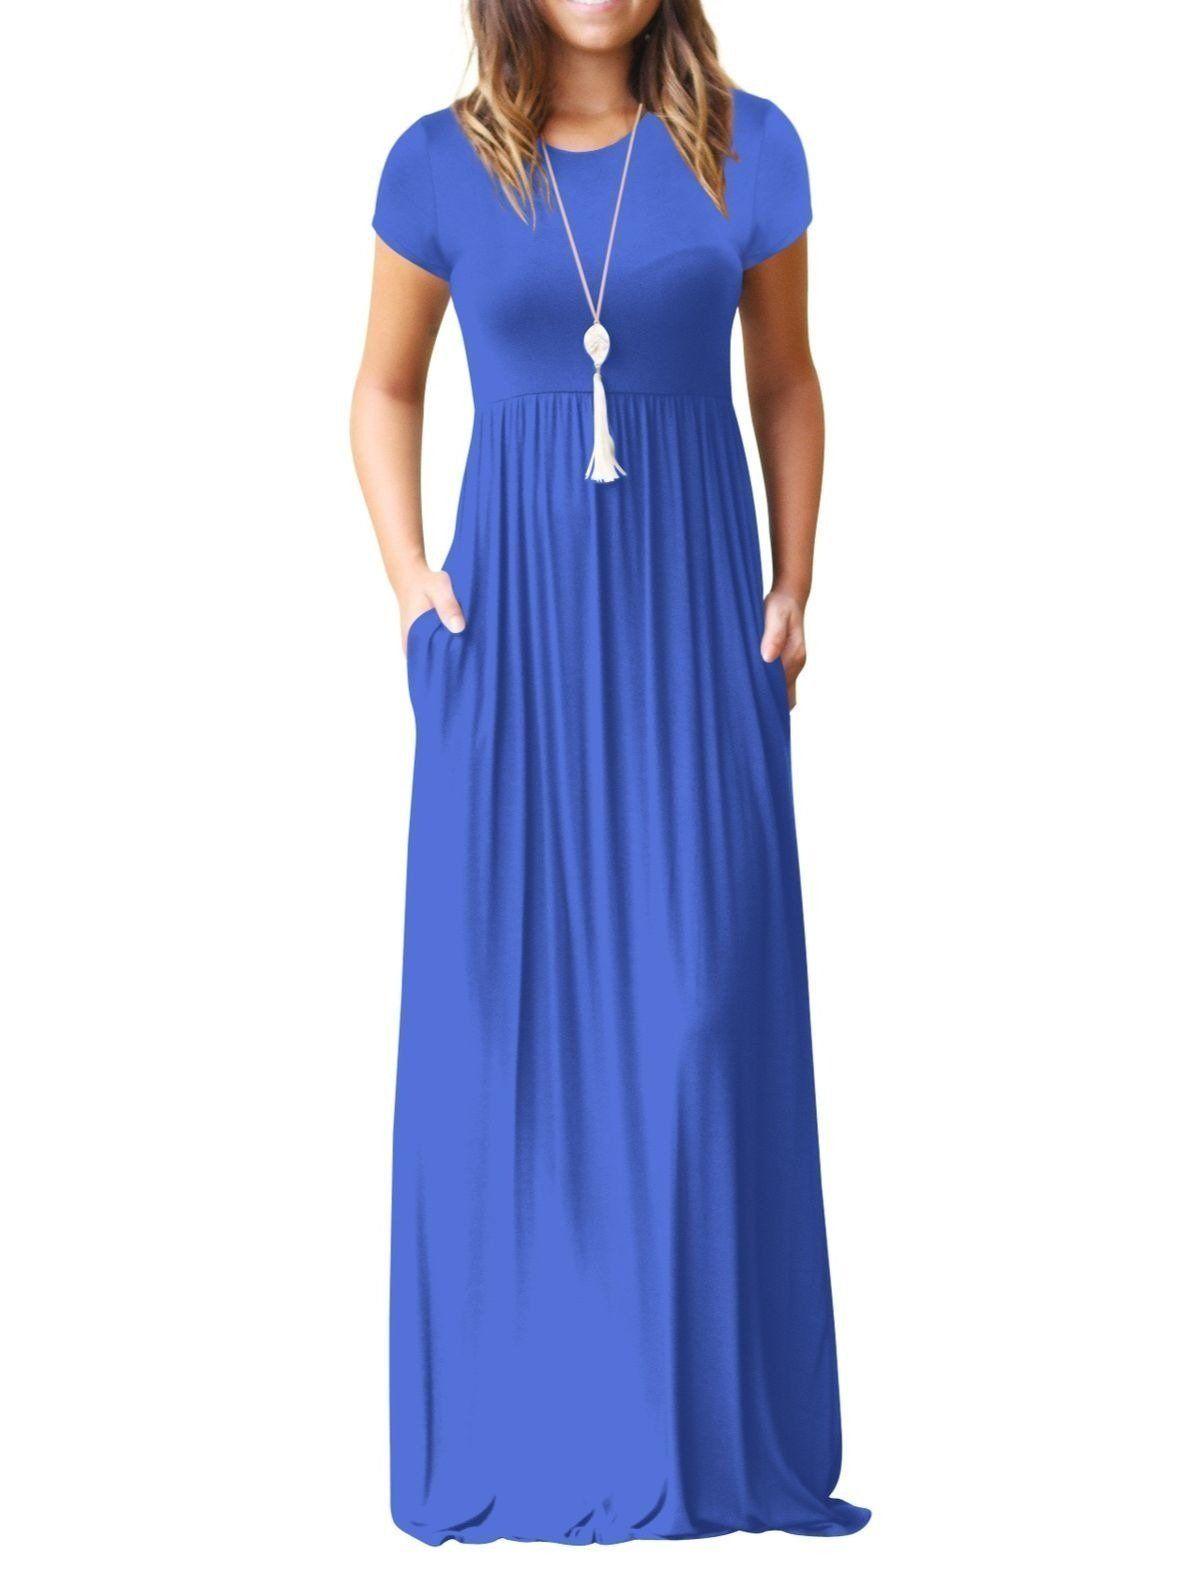 Women S Short Sleeve Maxi Dress With Pockets Plain Loose Swing Casual Floor Length Long Dresses Pocket Maxi Dress Short Sleeve Maxi Dresses Maxi Dress [ 1583 x 1187 Pixel ]